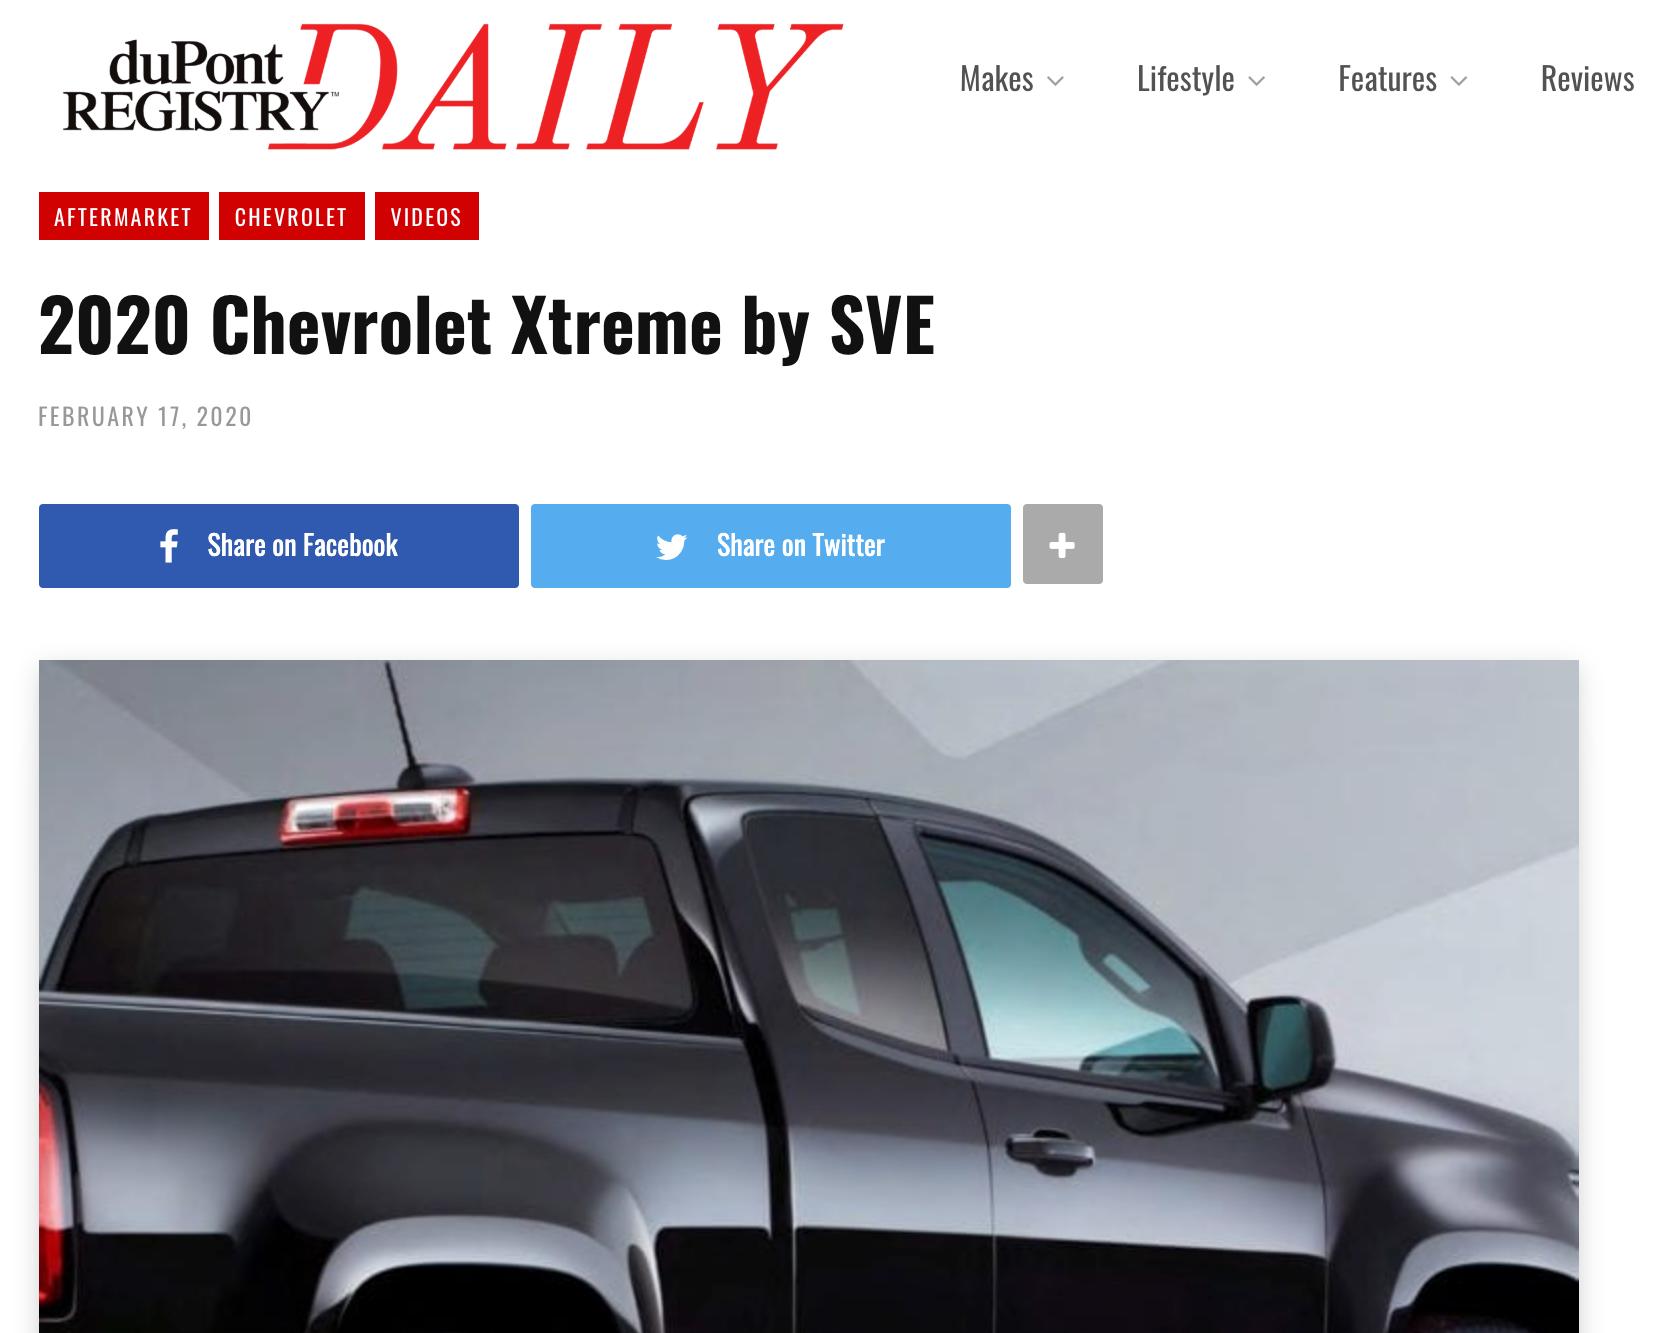 Dupont Registry article - eReleases press release service SVE Case Study